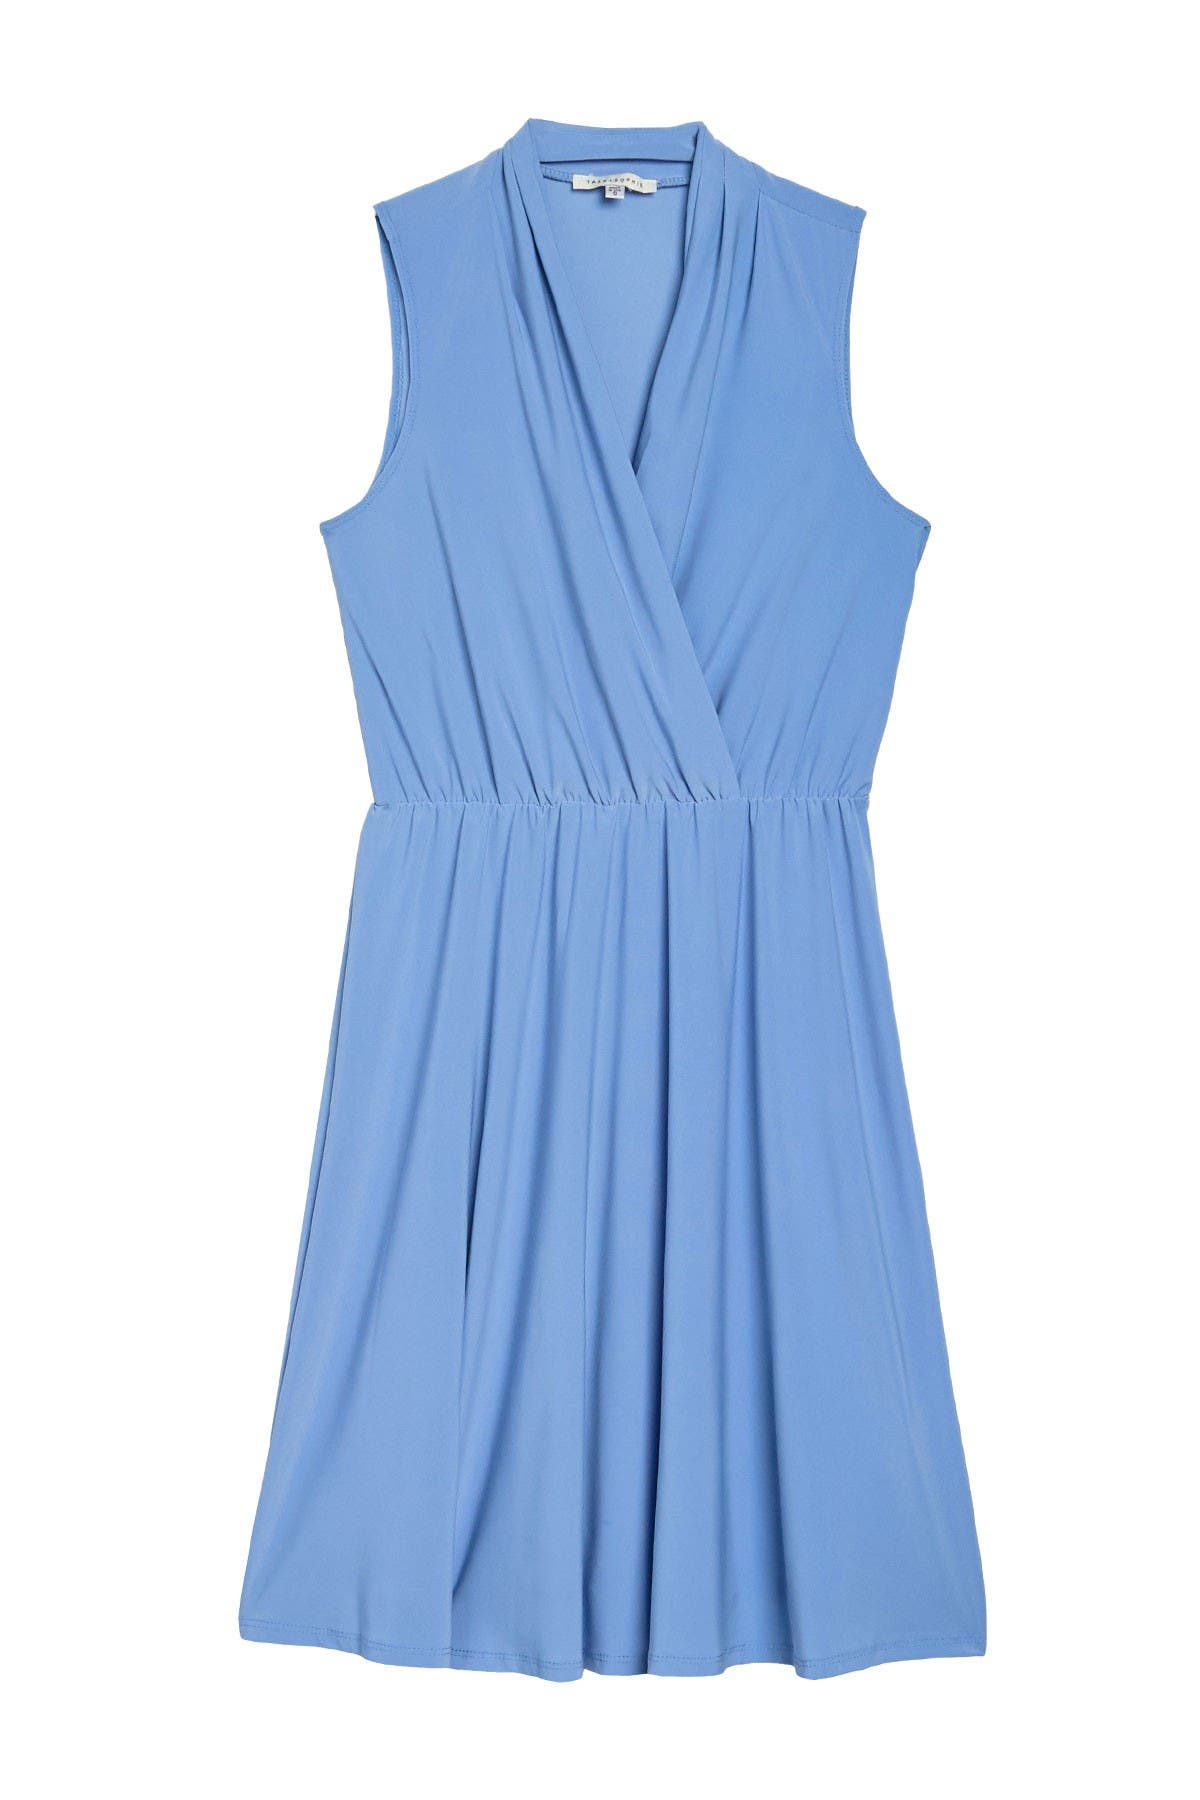 Image of TASH + SOPHIE Surplice Sleeveless Dress